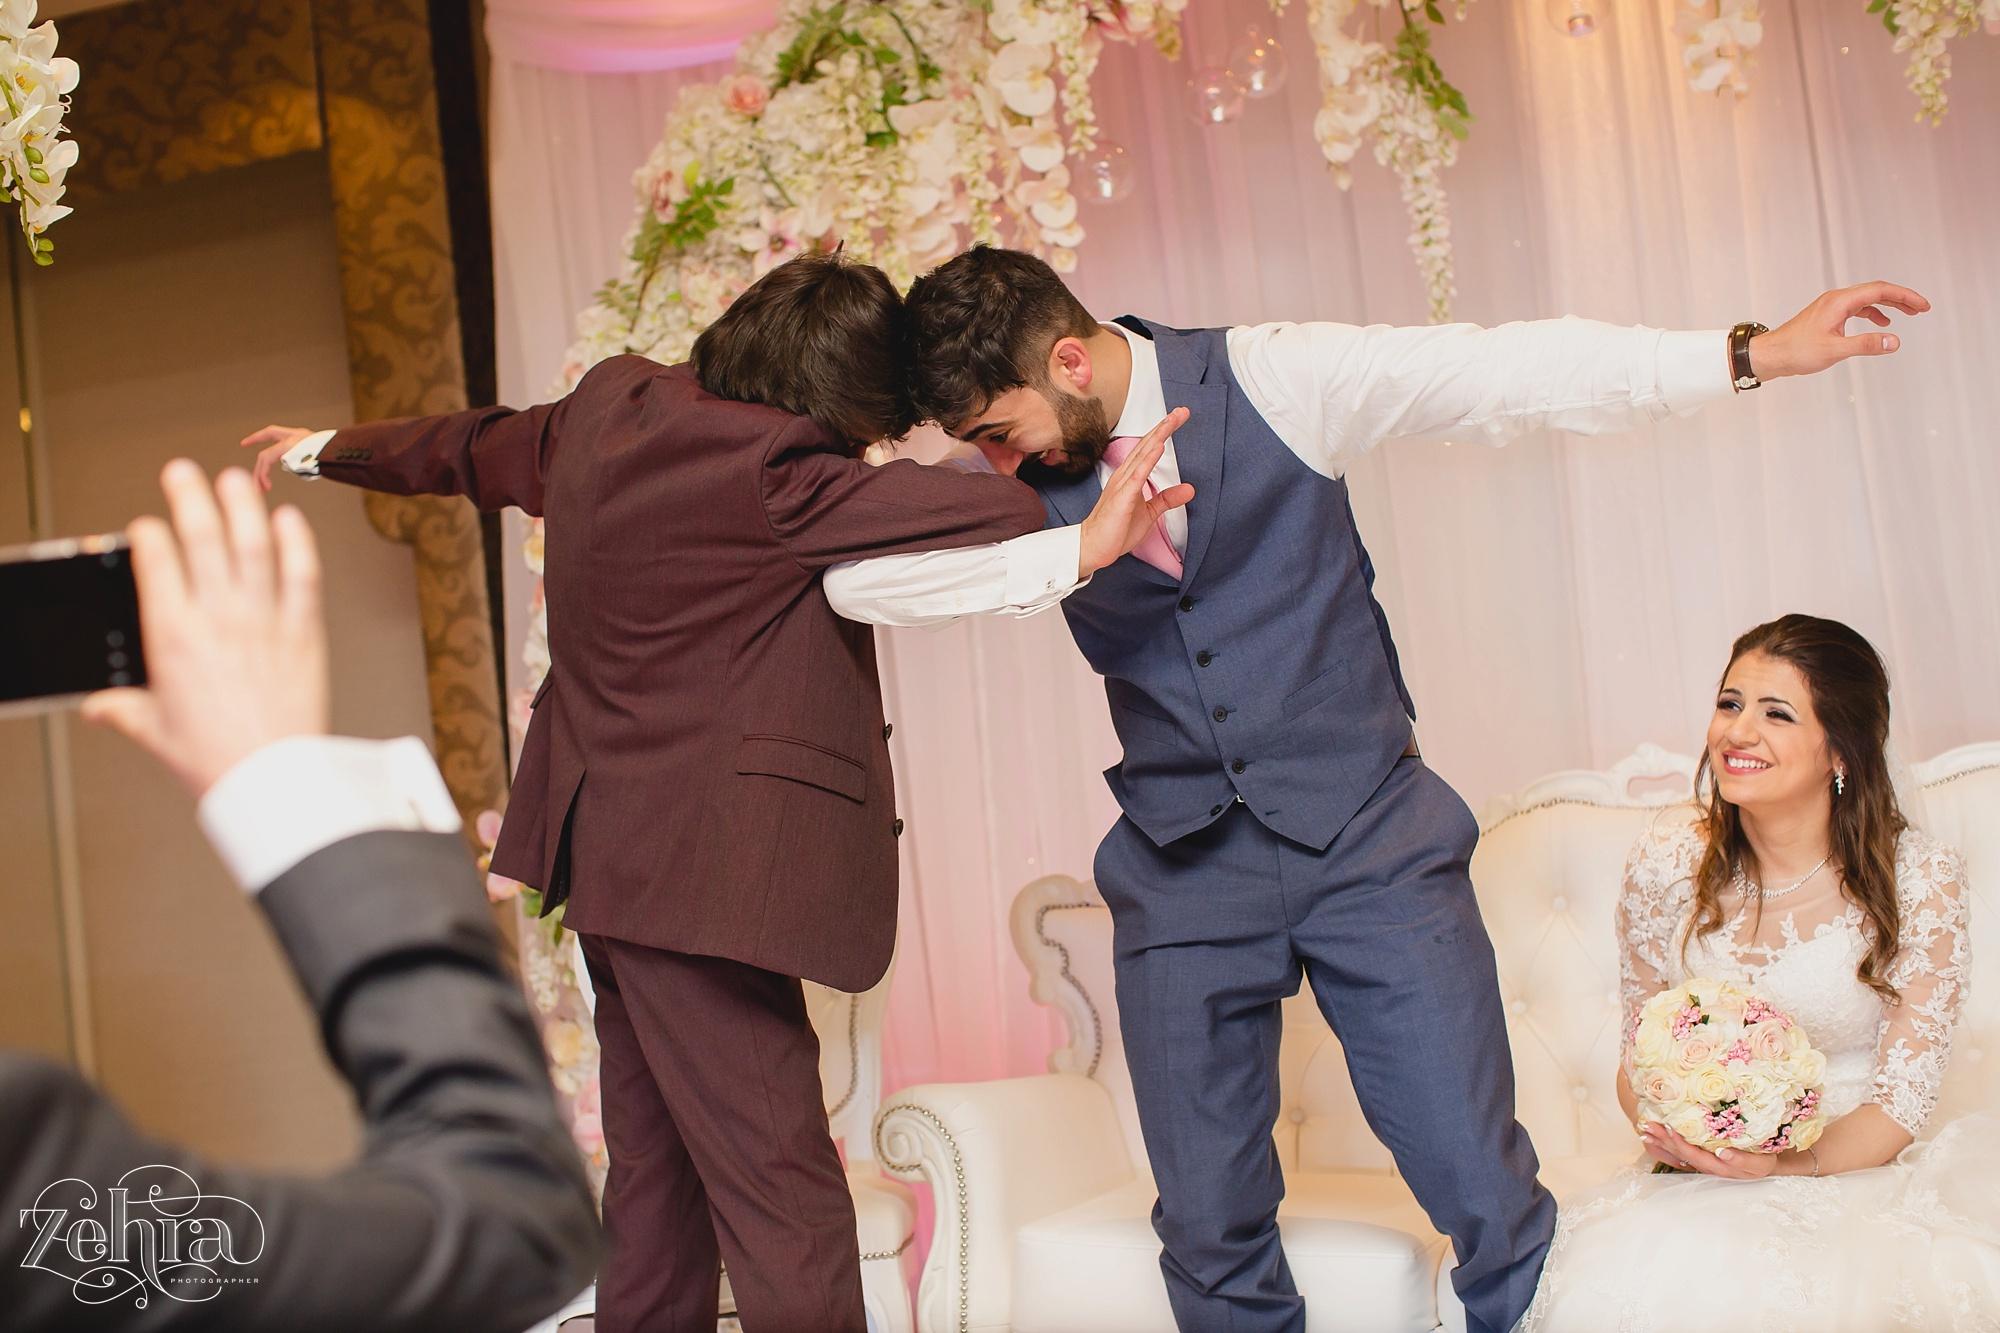 zehra photographer mere cheshire wedding_0059.jpg